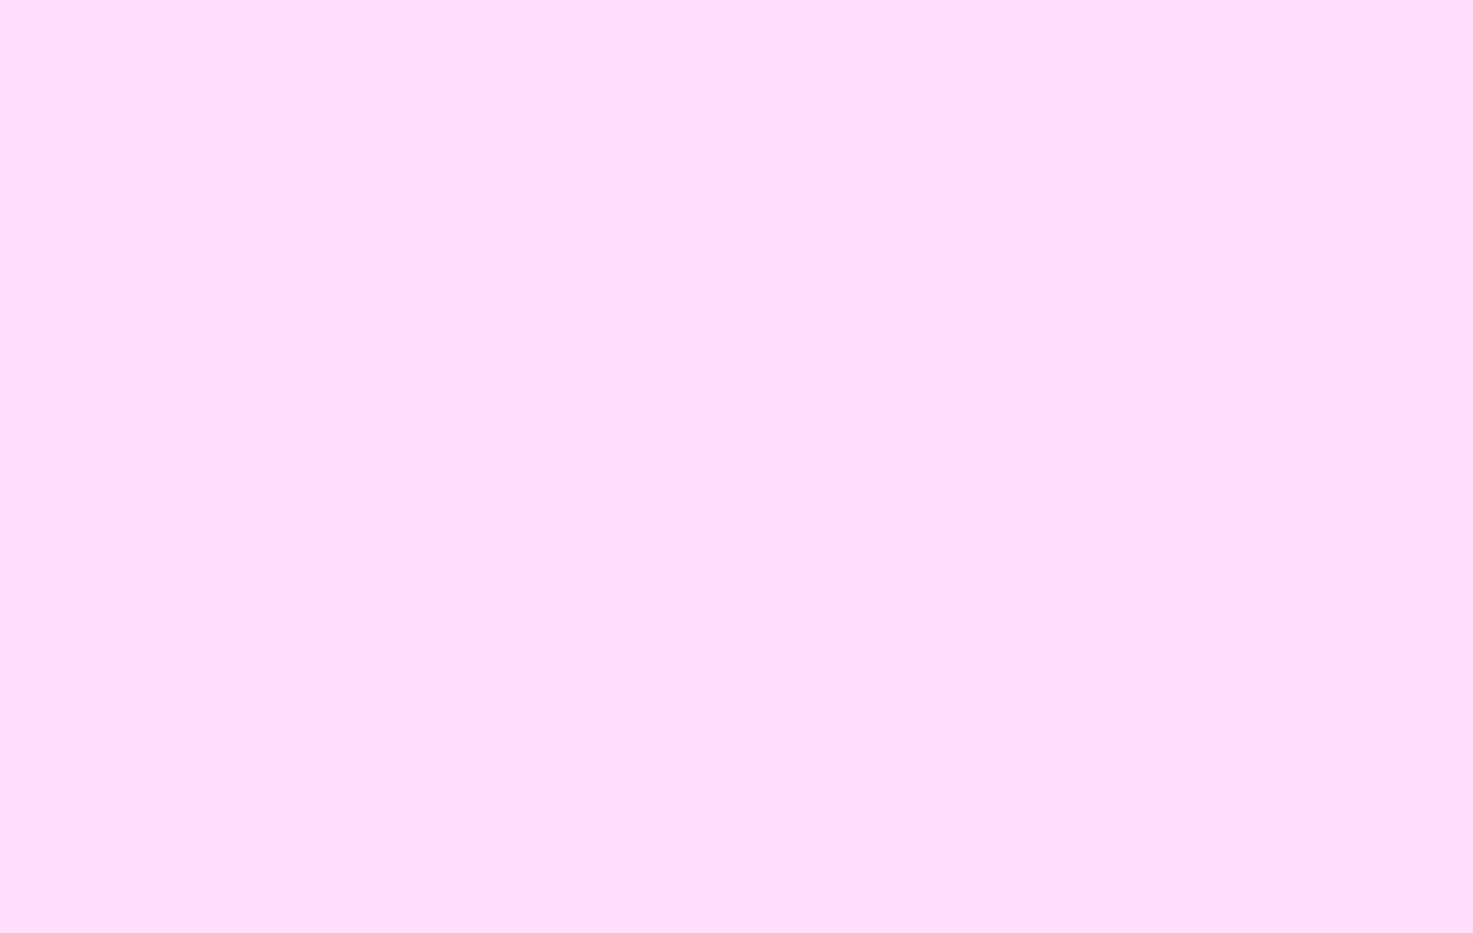 rosa baby 512